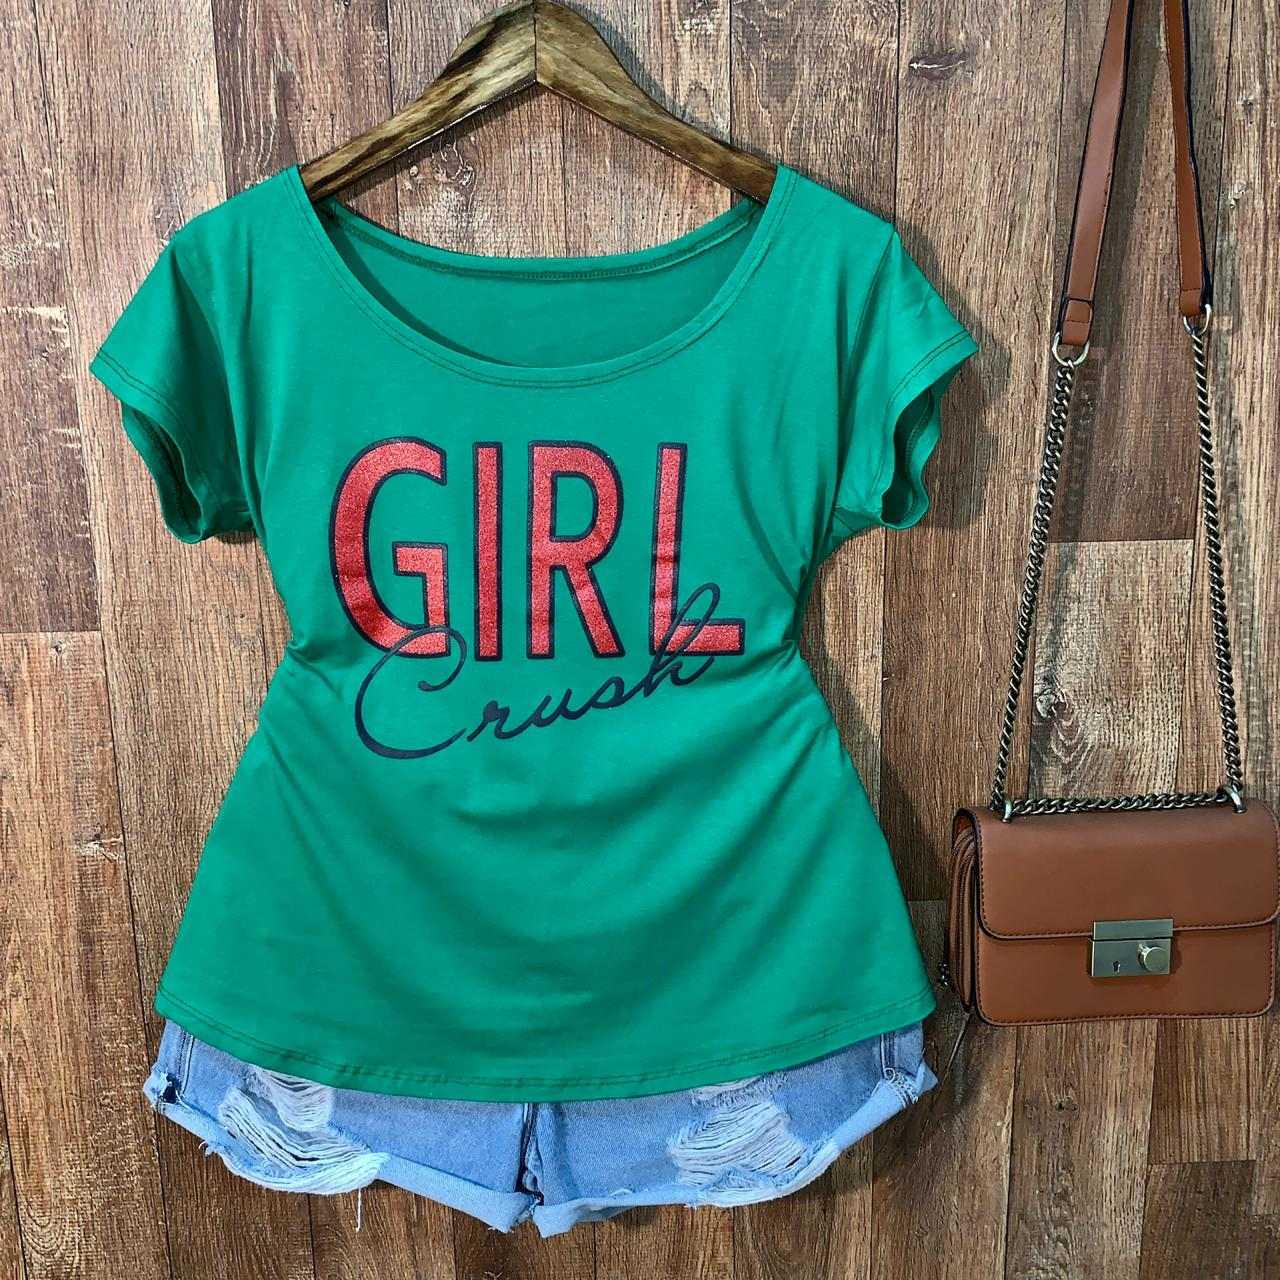 T-shirt Plus Size Girl Crush